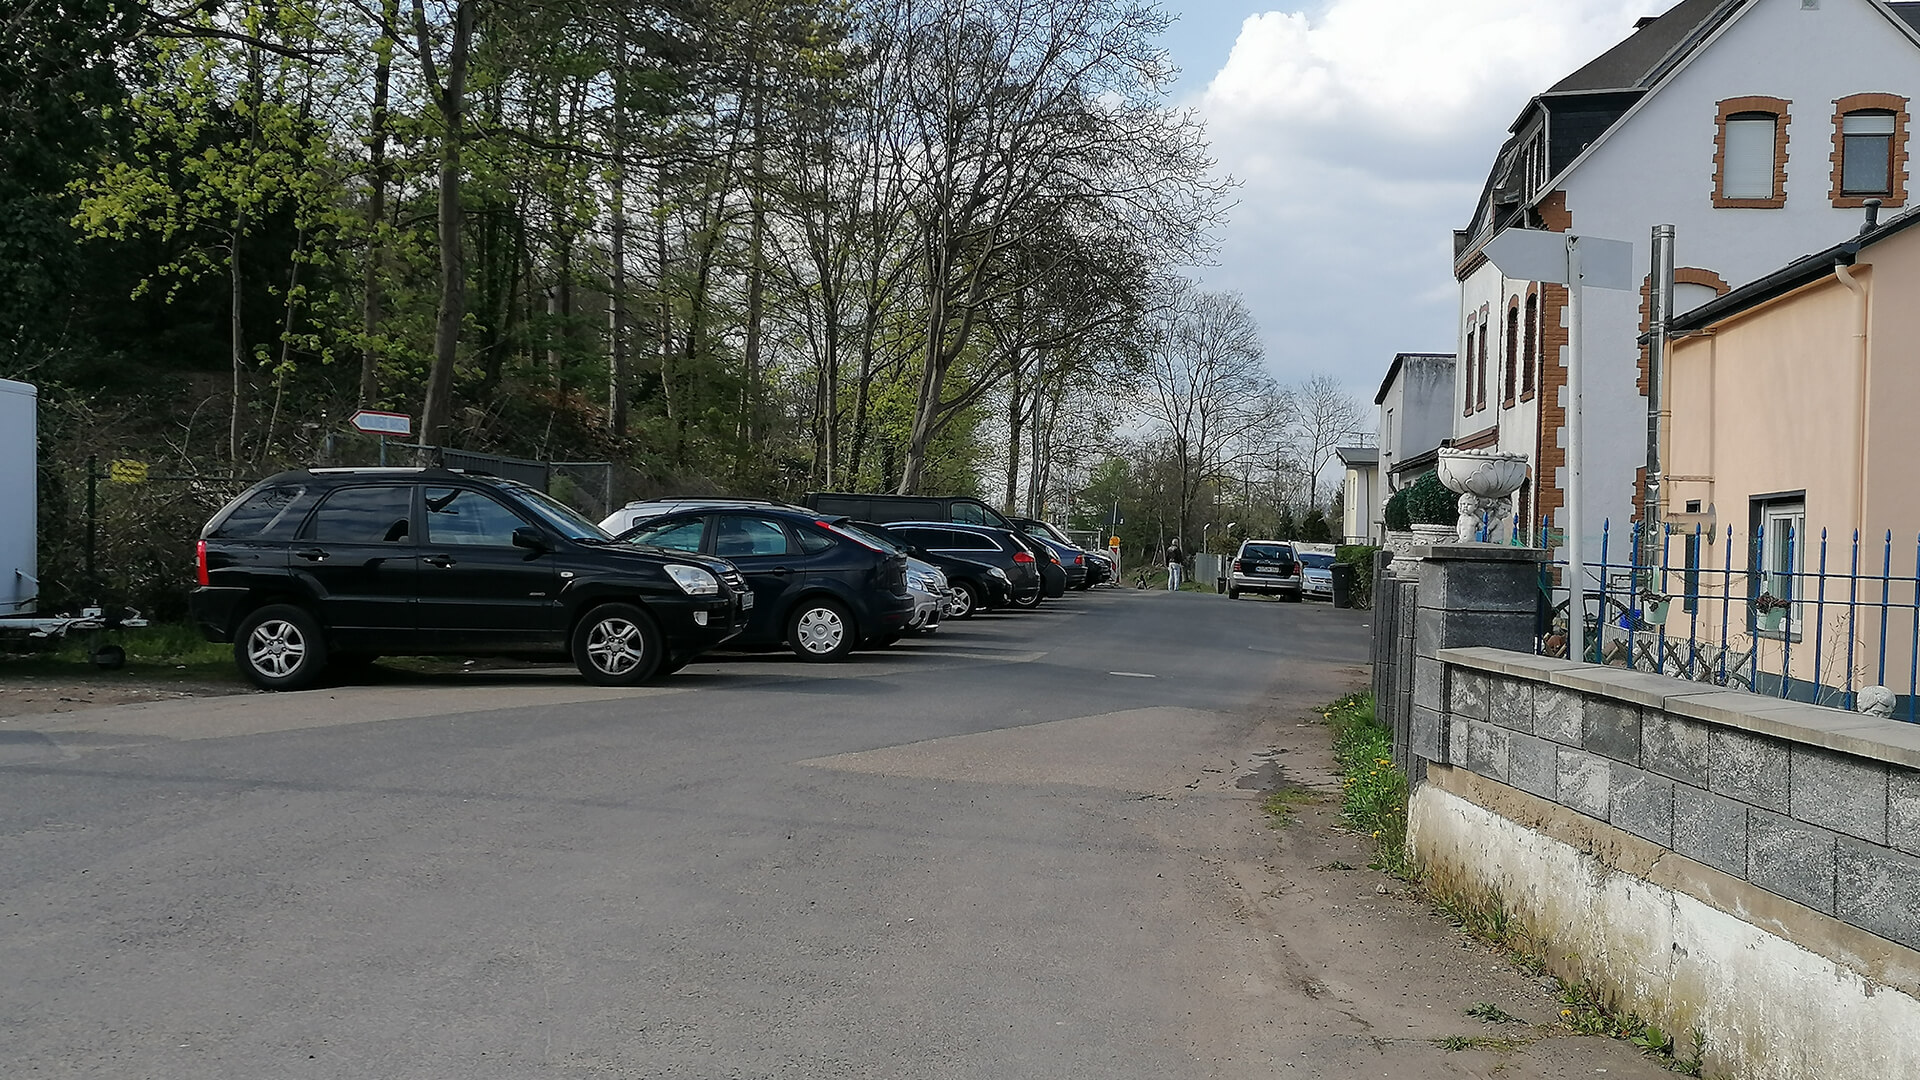 koblenz-luetzel-projekte-handlungsfelder-2-3-6c